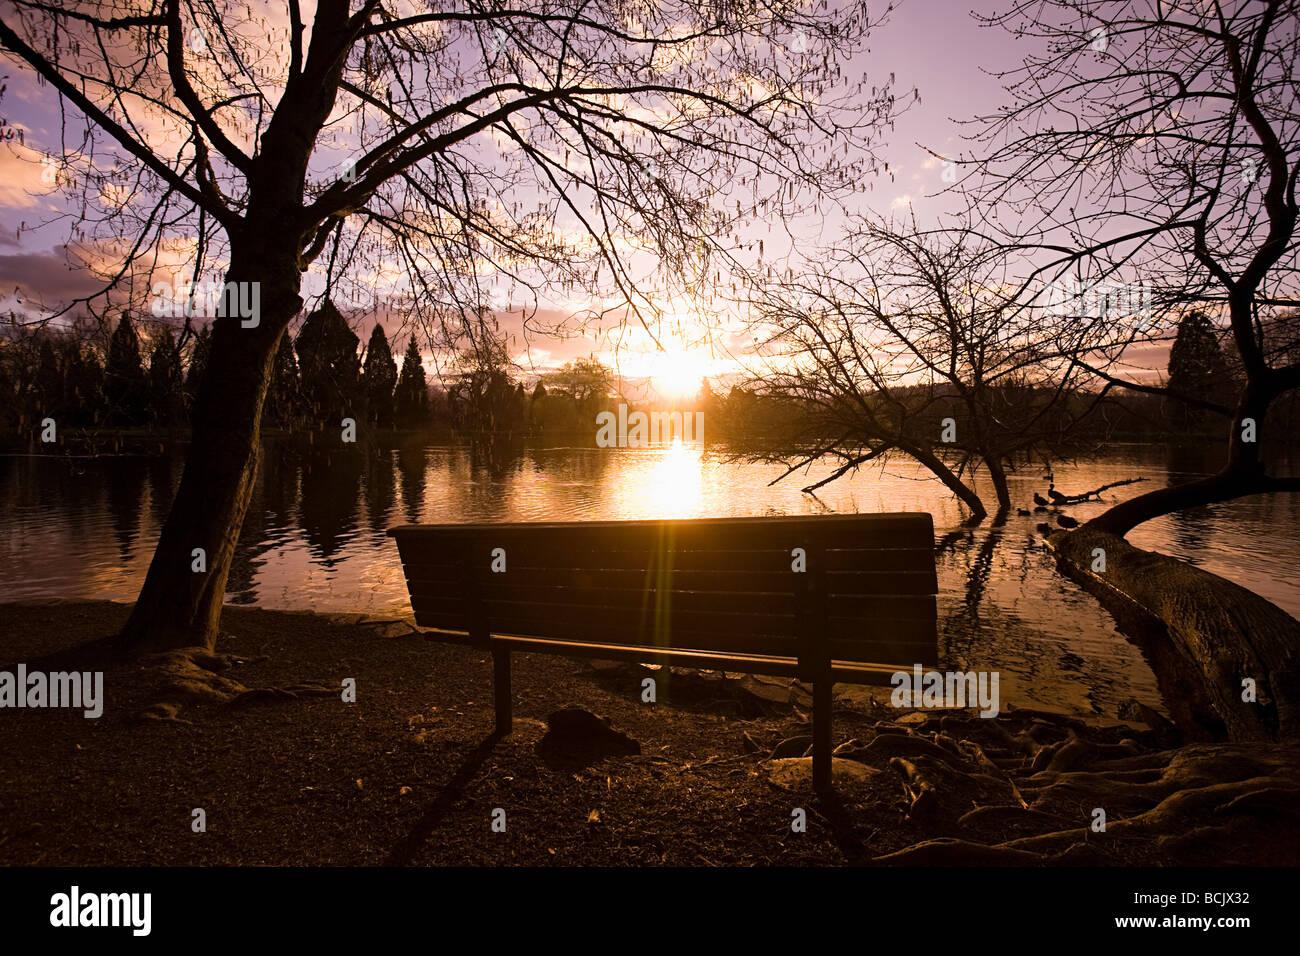 Puesta de sol sobre el lago Foto de stock